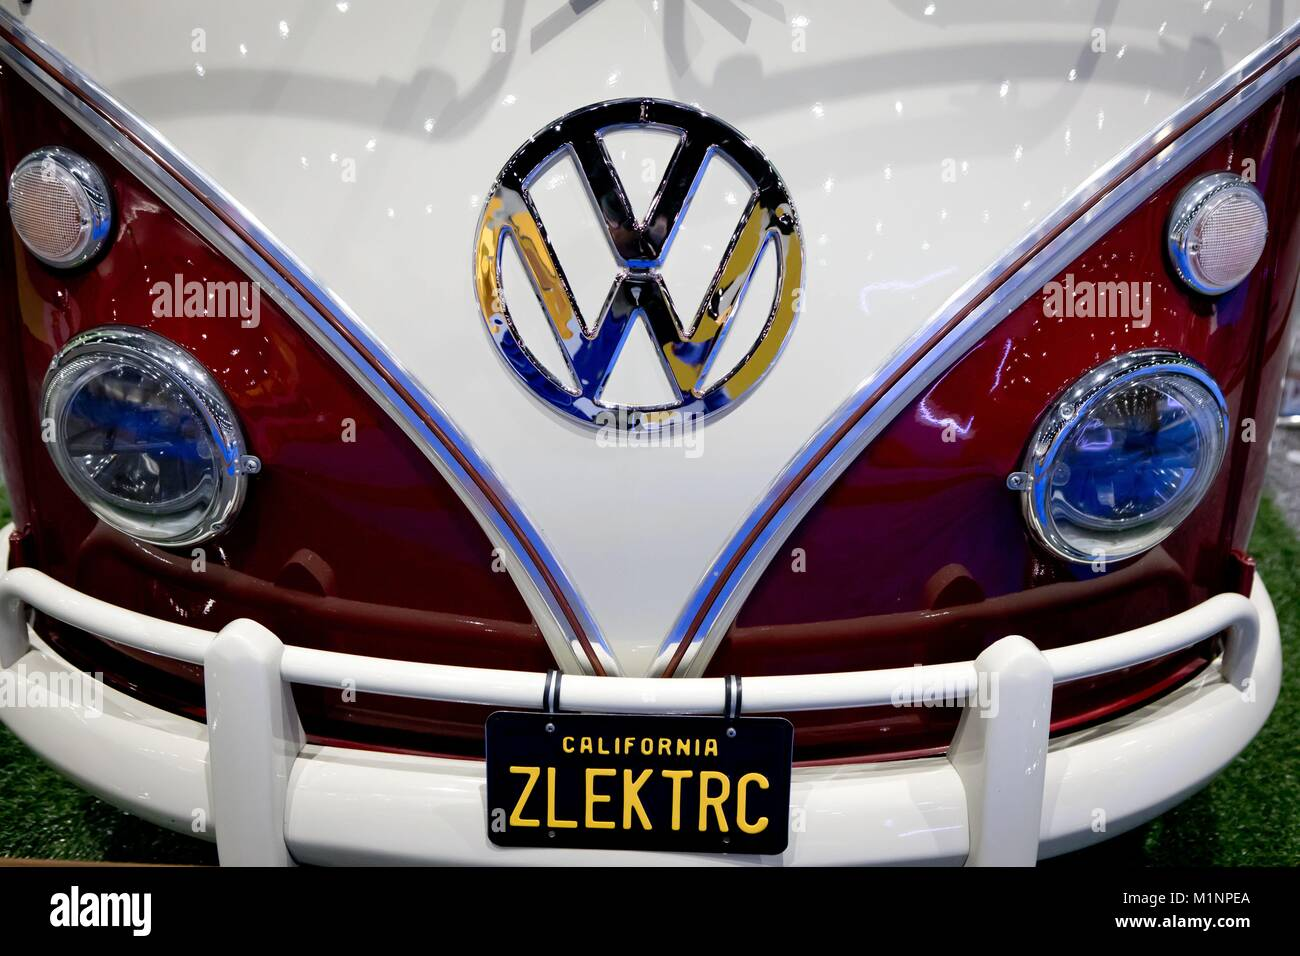 photos camper volkswagen bug air beetle san diego bay early splitty vintage combi cooled vw bus type tijuana gallery